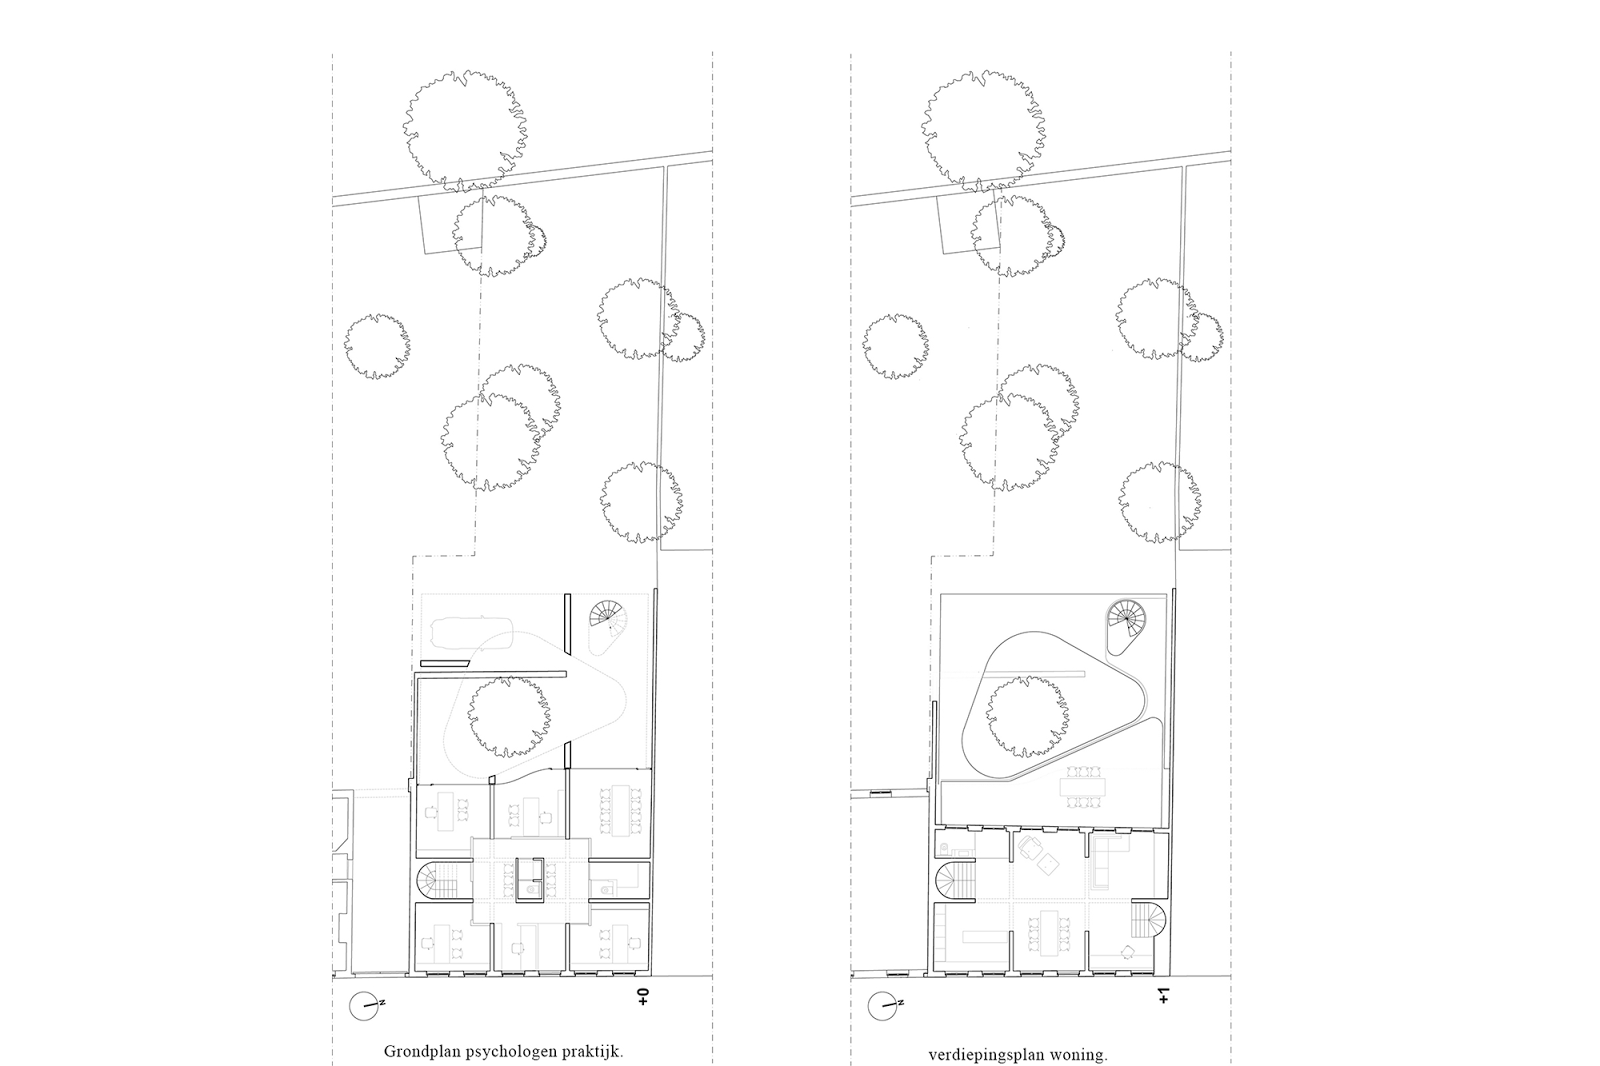 a f a s i a: GRAUX & BAEYENS architects